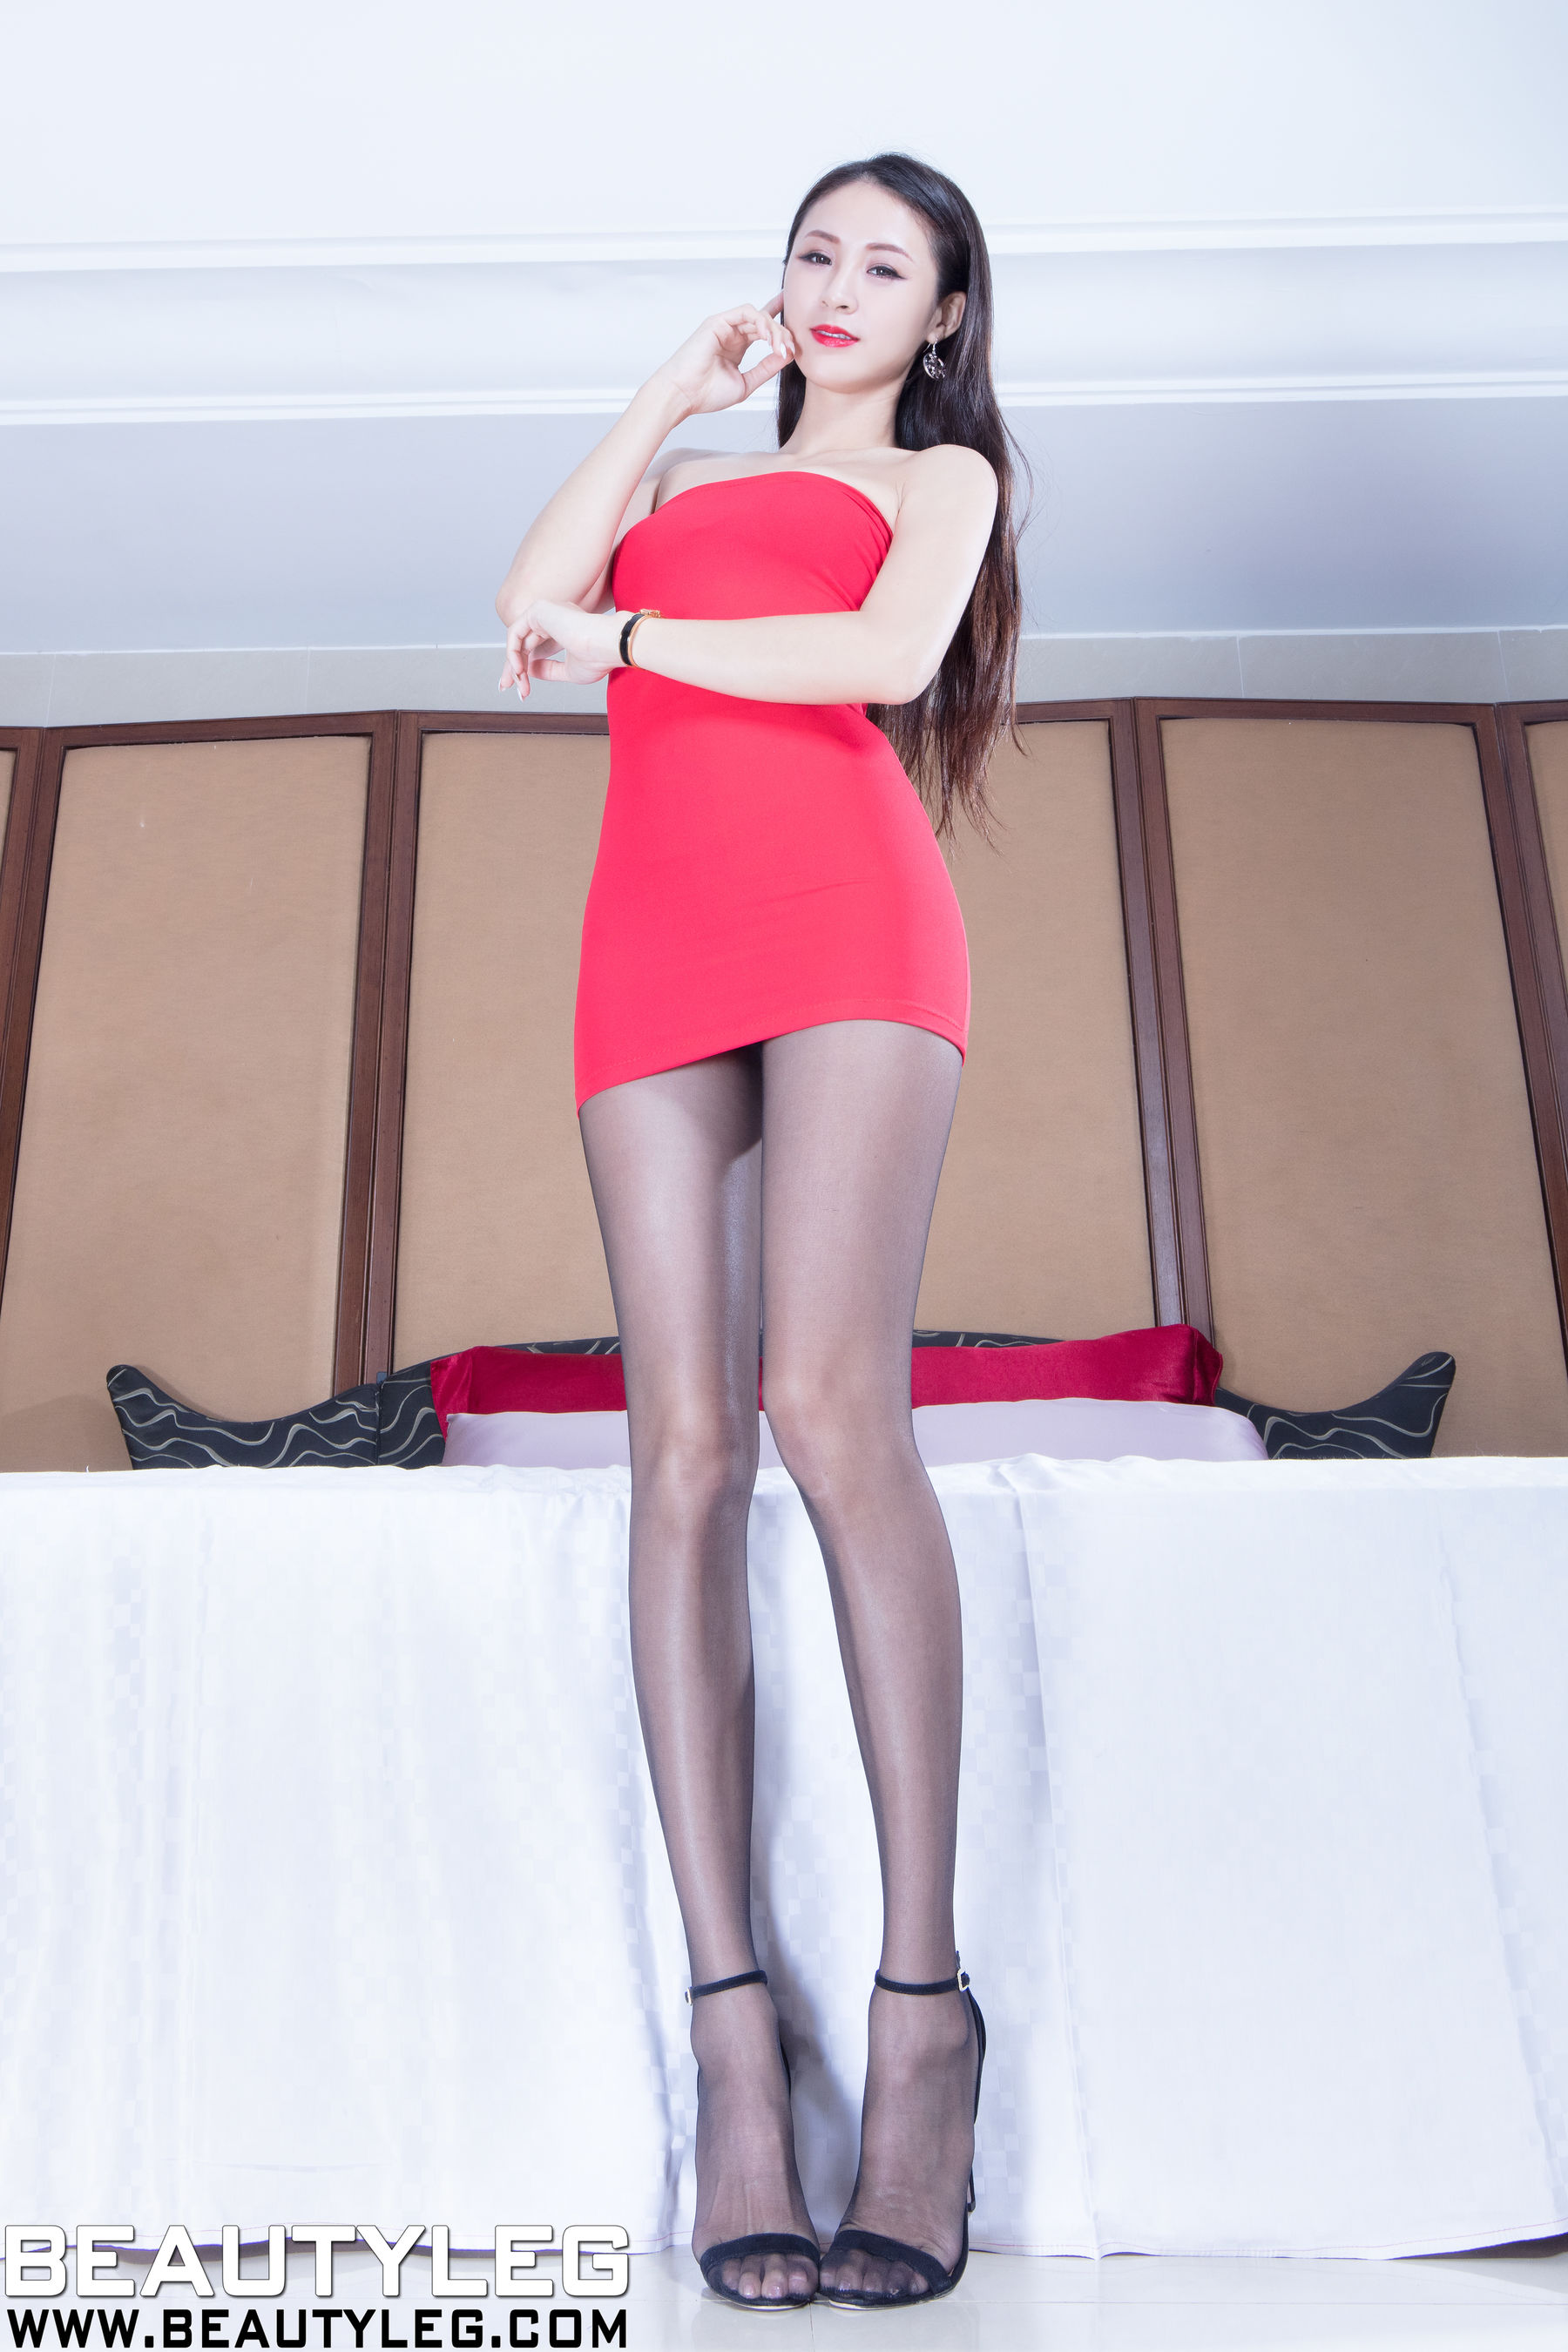 VOL.1300 [Beautyleg]超短裙美腿高跟:Lola雪岑(腿模Lola)超高清个人性感漂亮大图(55P)